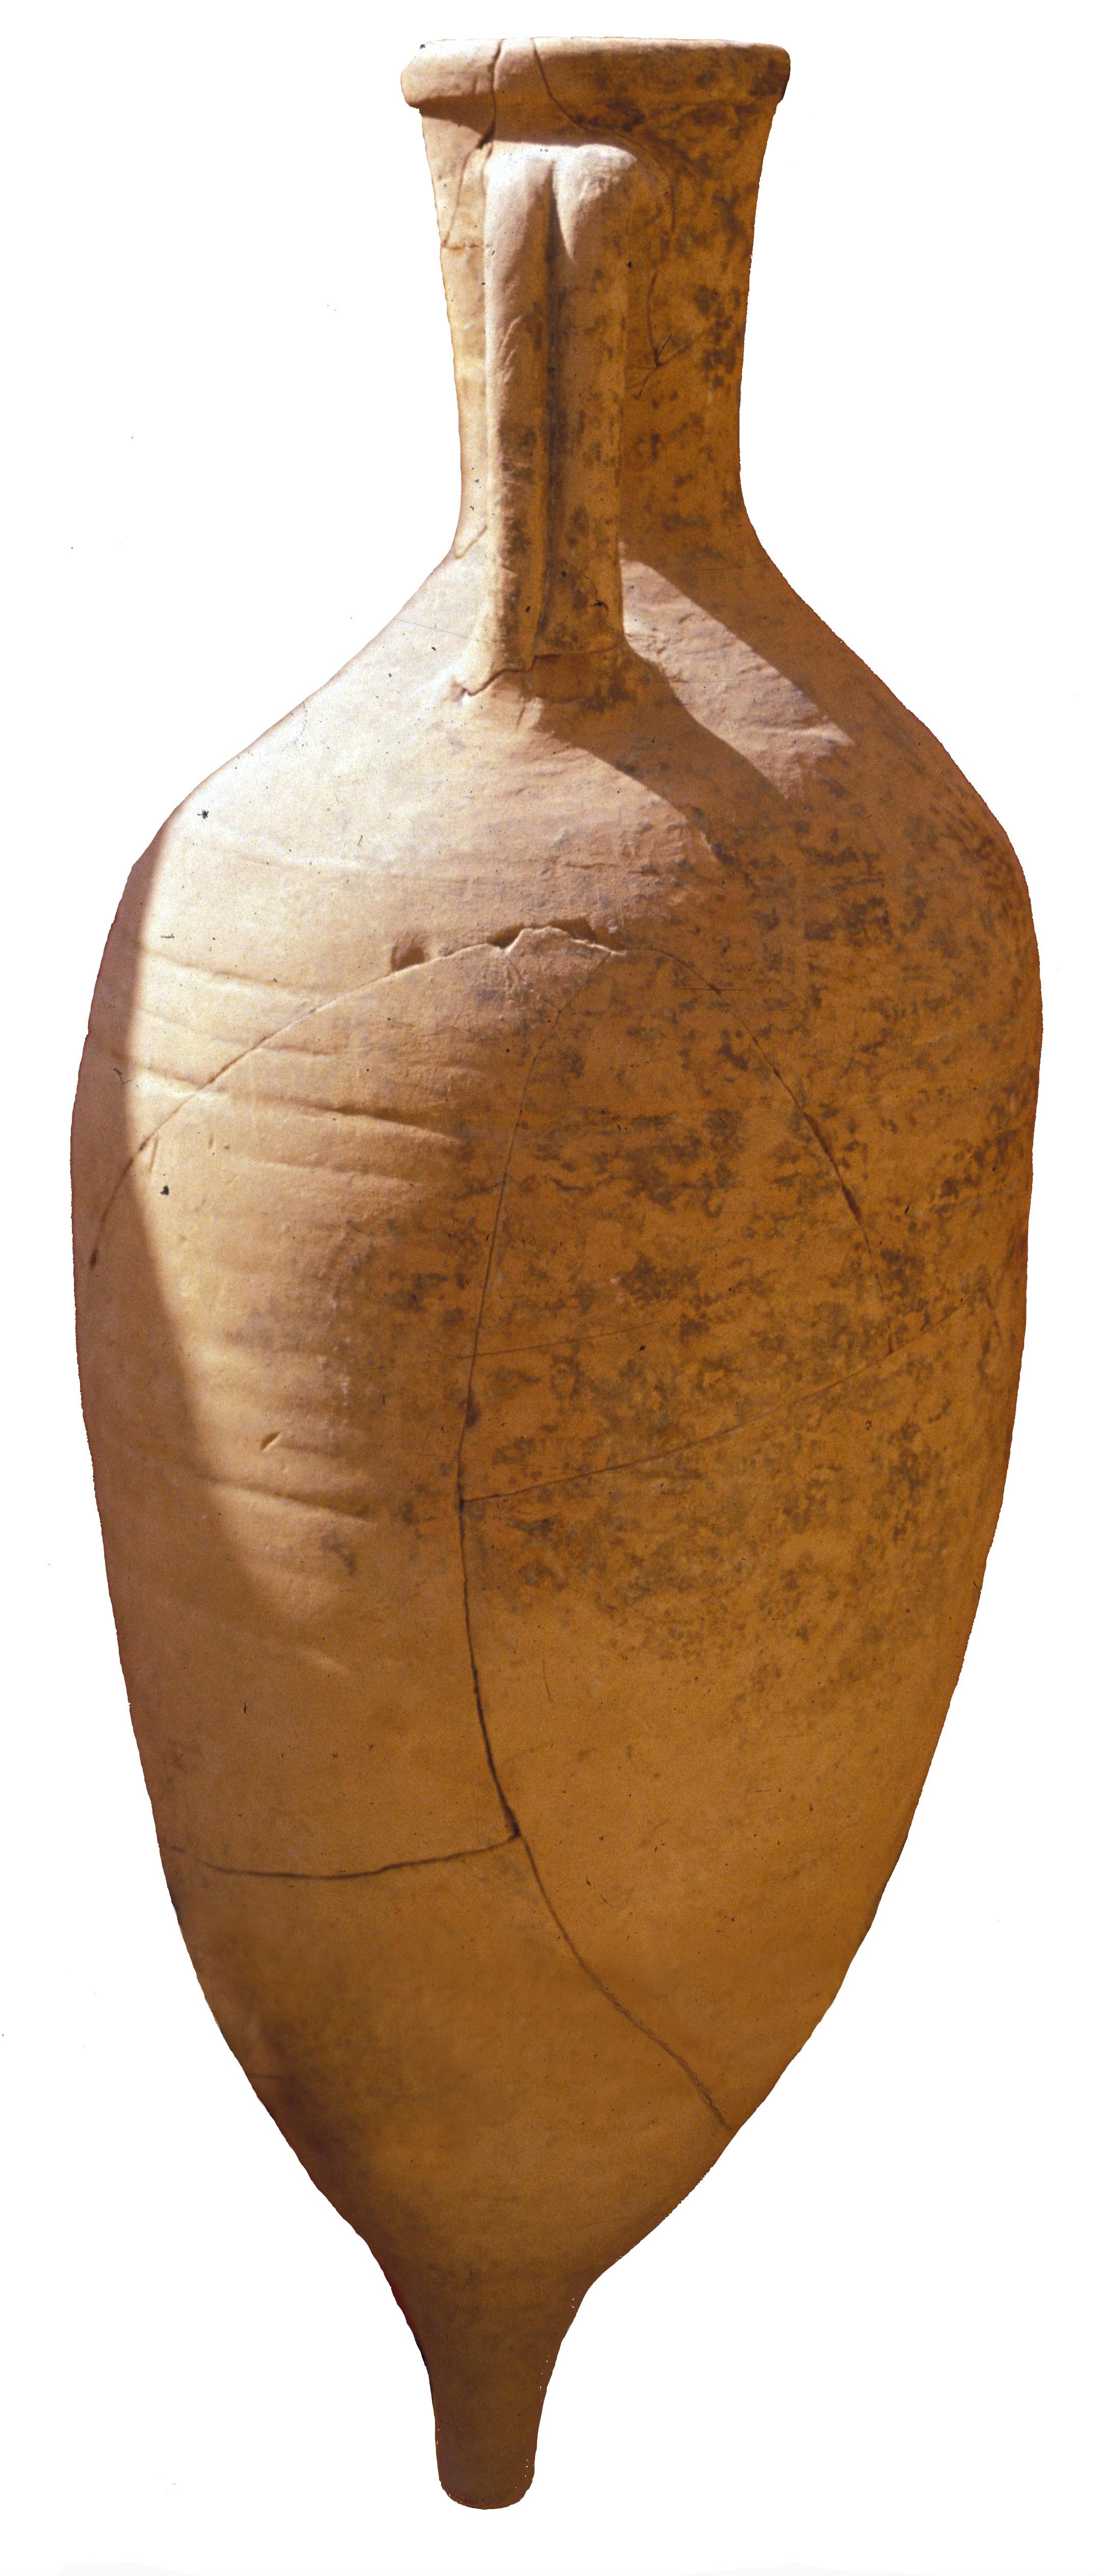 Ànfora vinària Dressel 2/4 (50 L.)